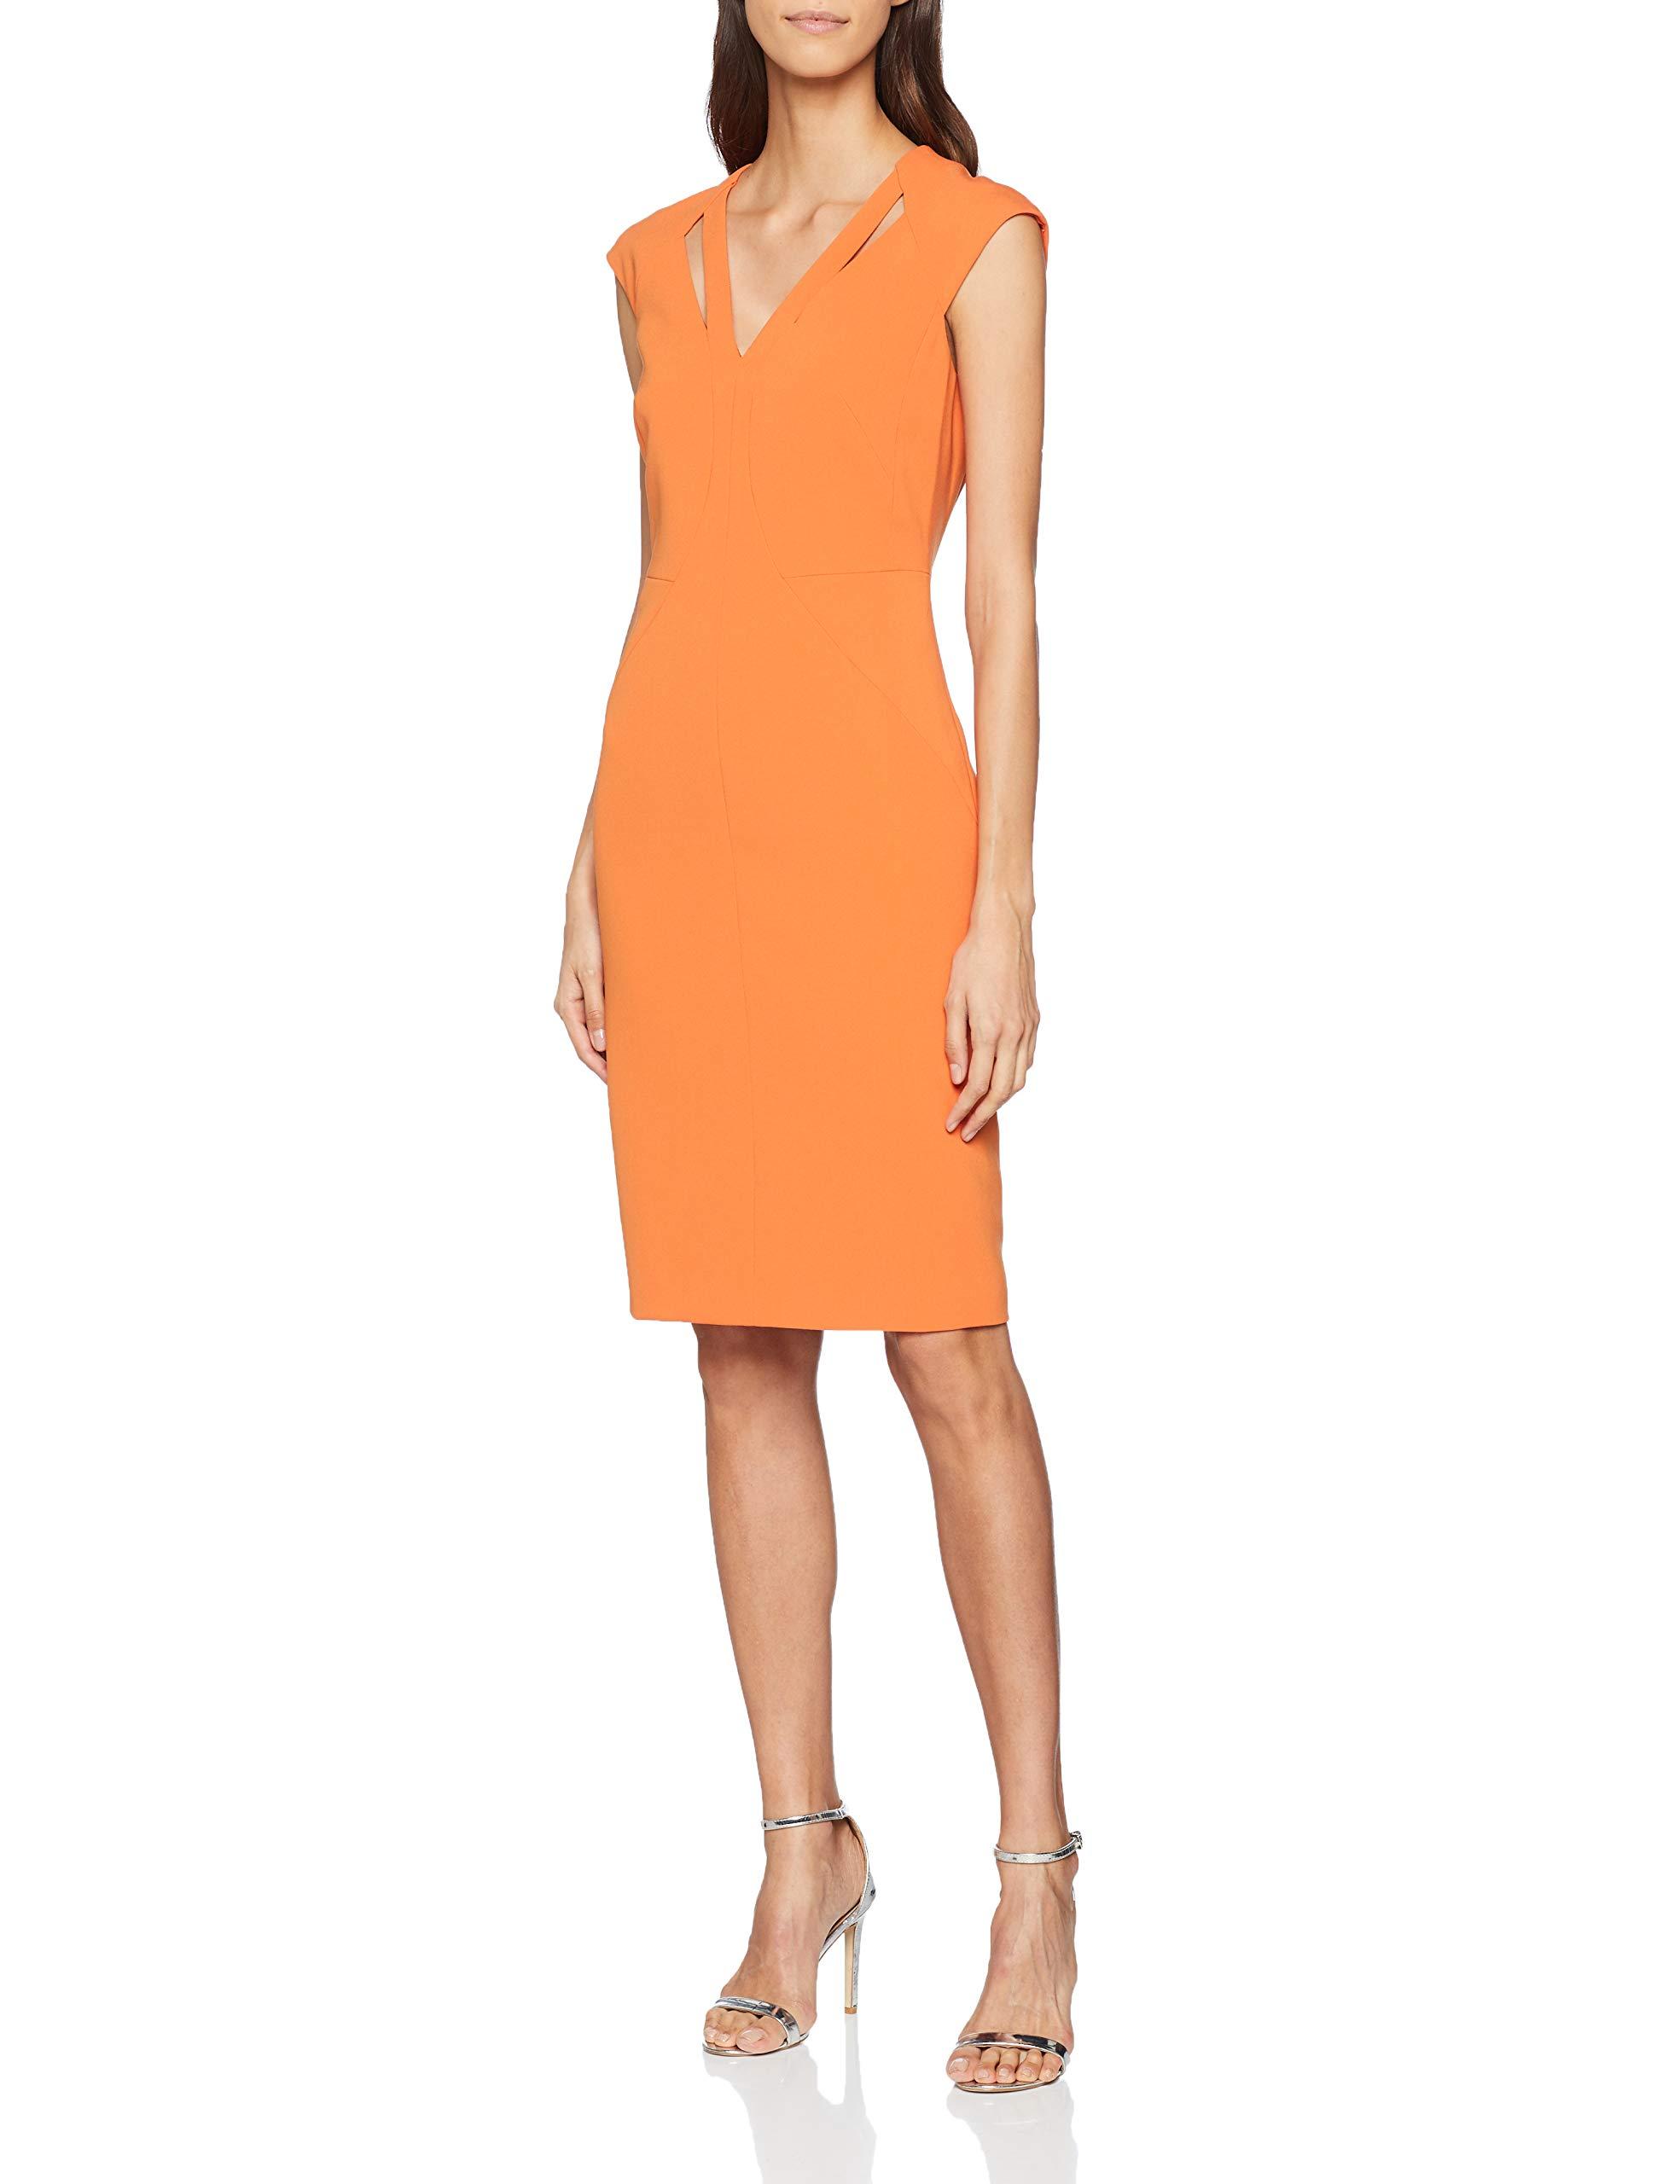 FabricantUk Contour Robe SoiréeOrange36taille Karen Millen Out De 8Femme Cut Dress EH9ID2